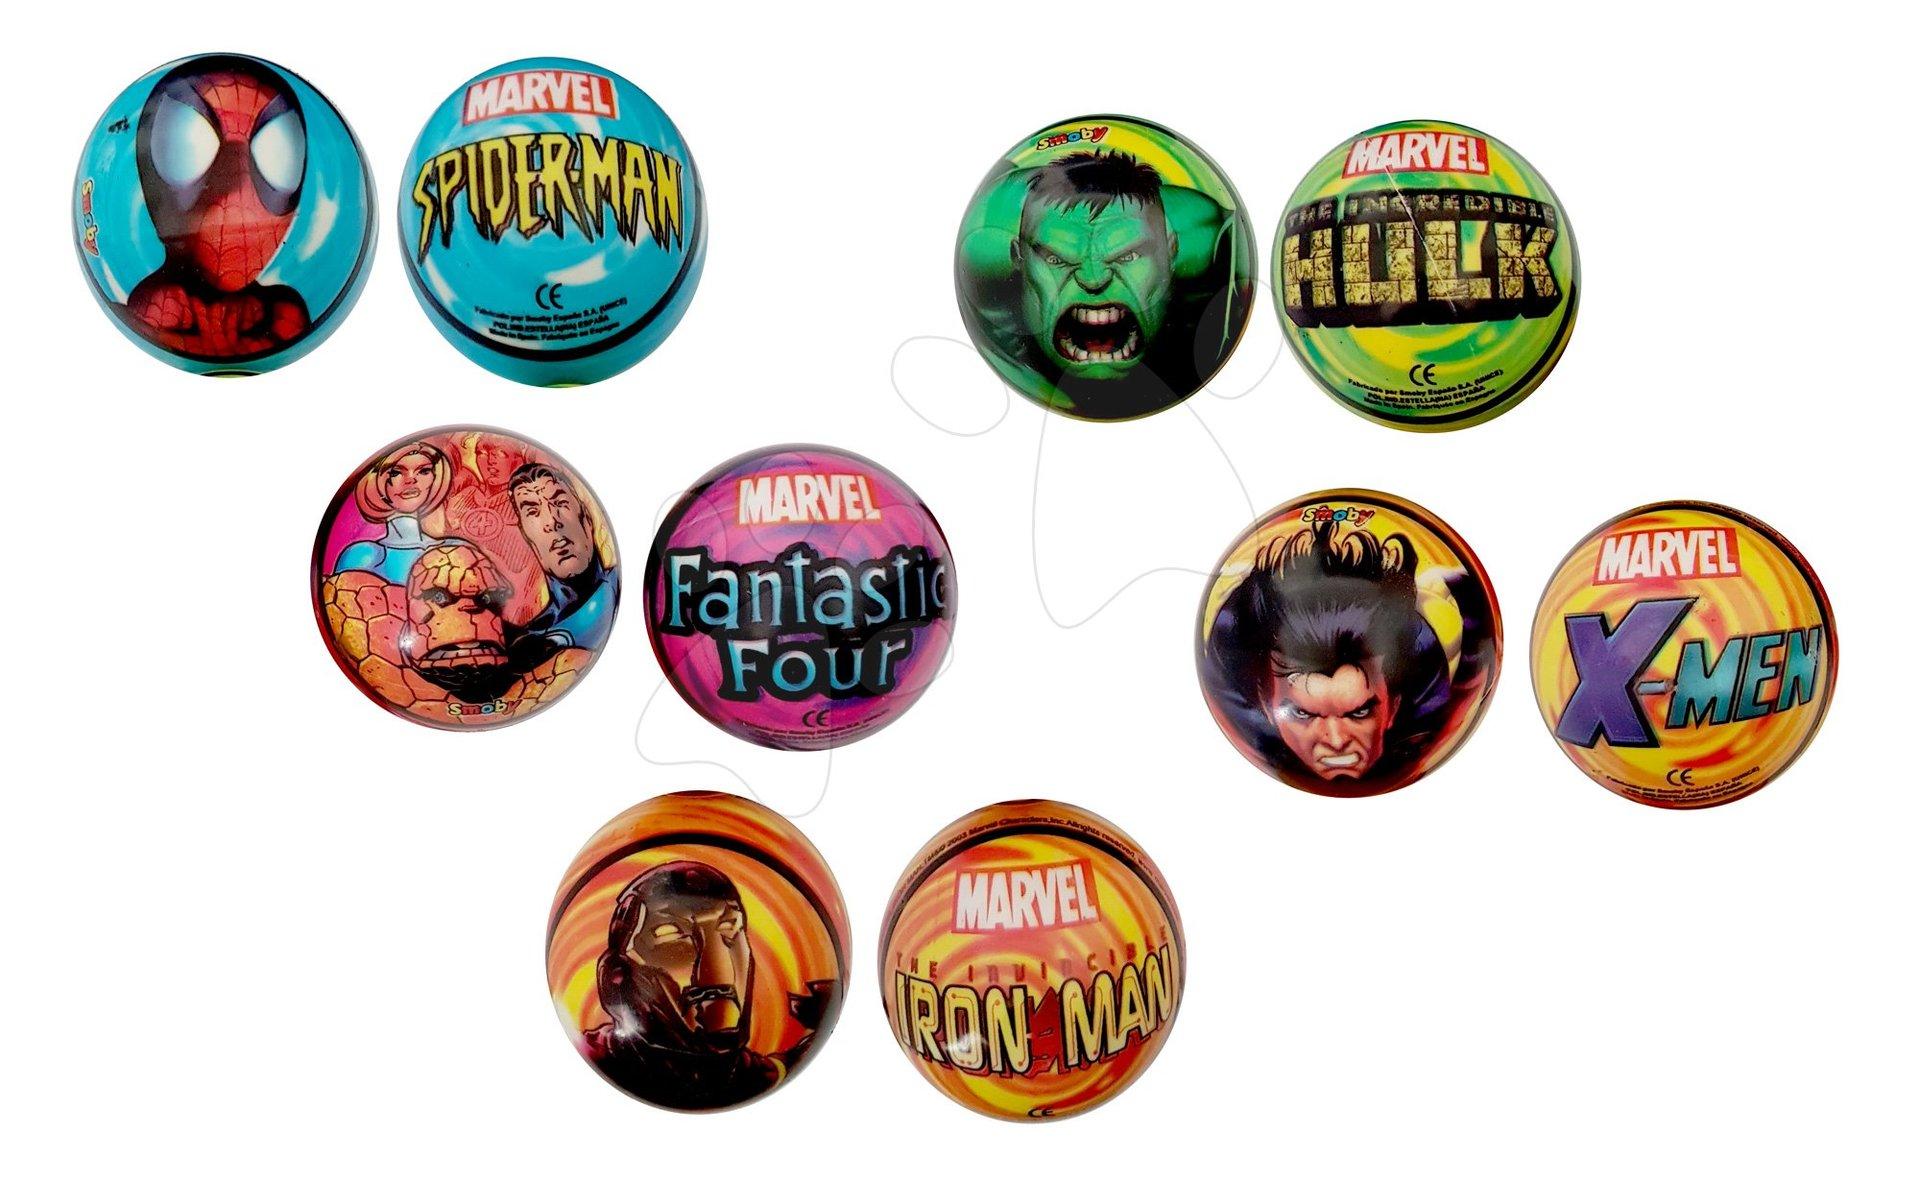 Pohádkové míče - Pohádkový míč licenční Mondo 6 cm